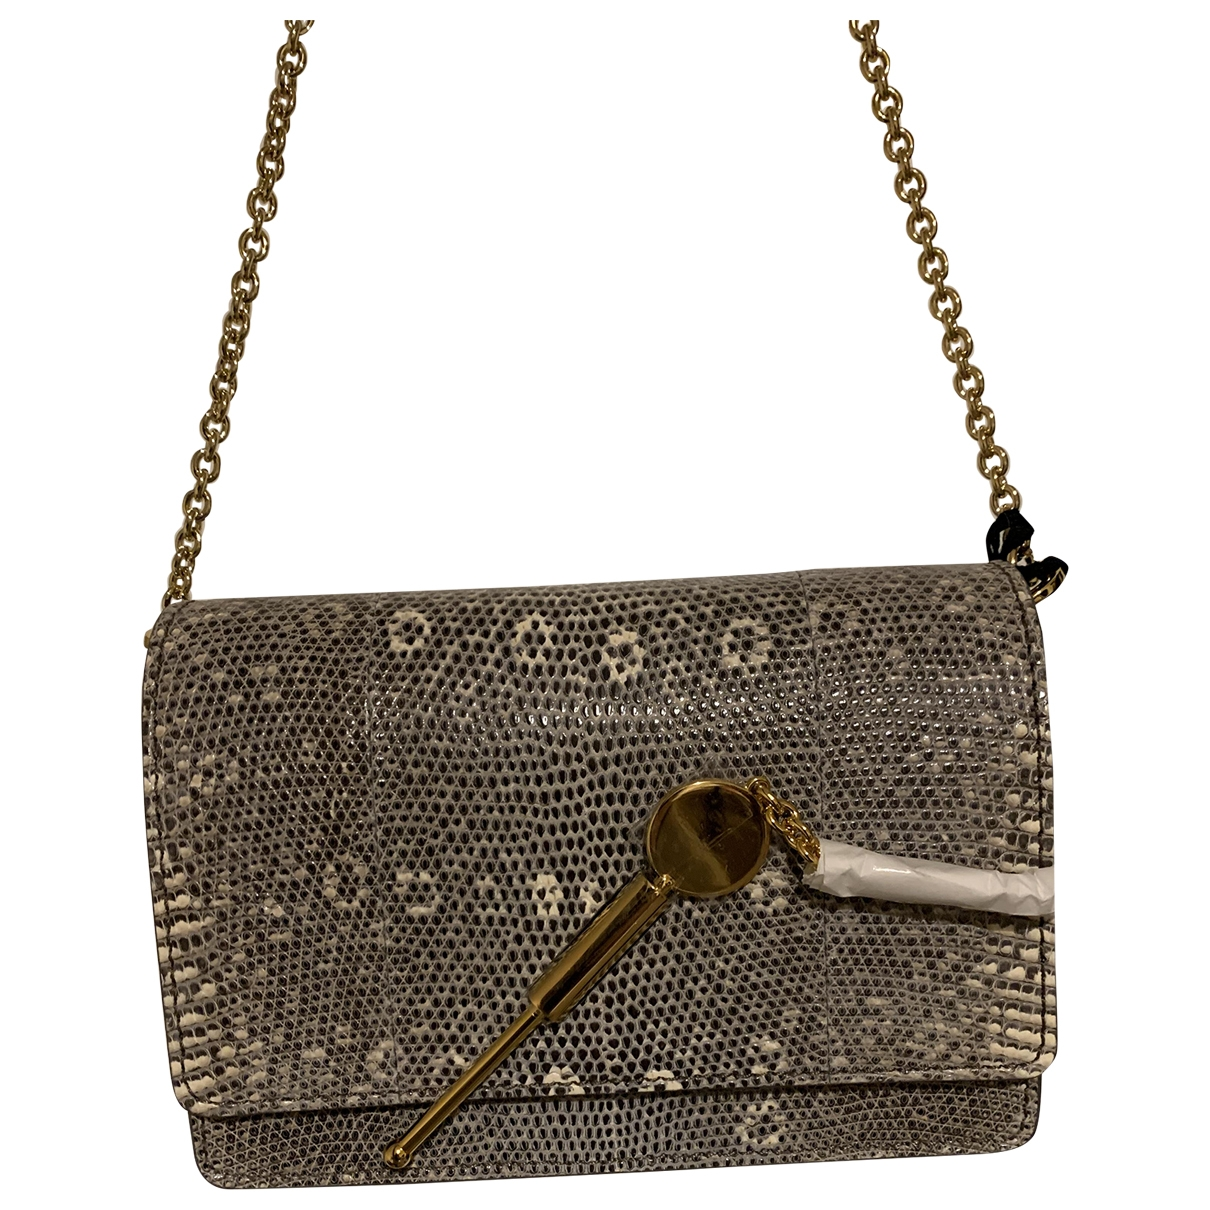 Sophie Hulme \N Handtasche in Exotenleder